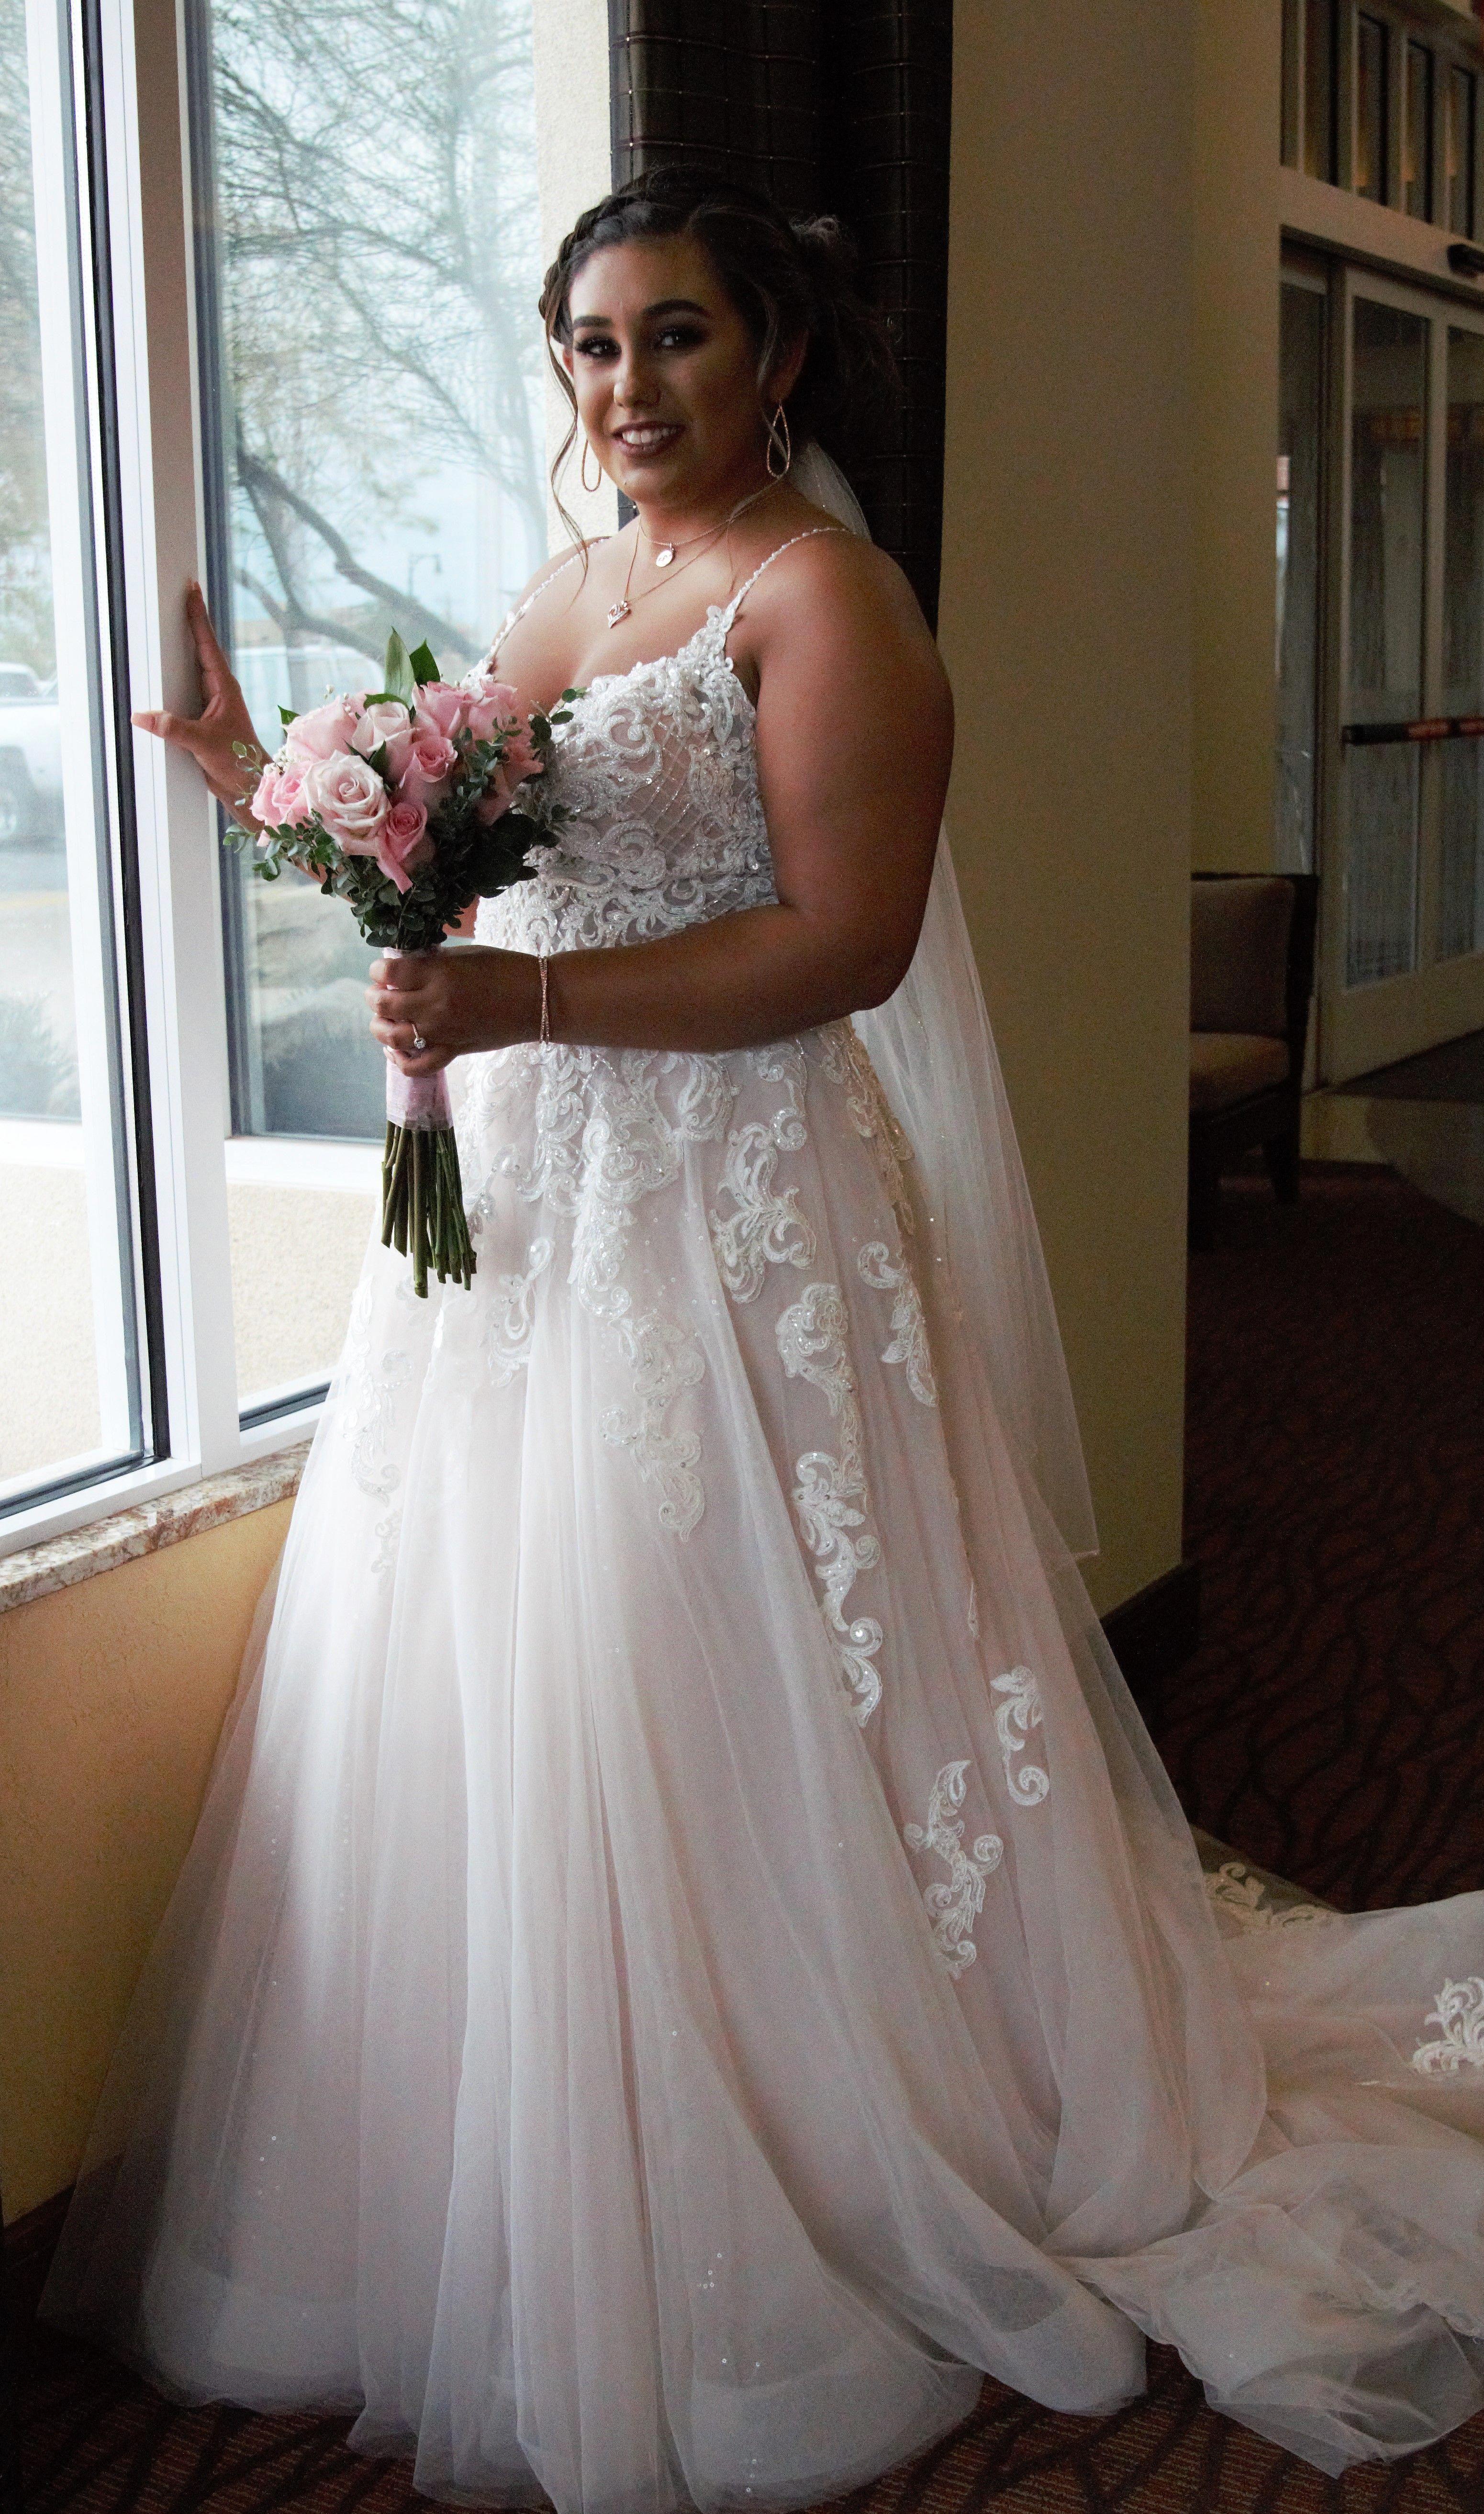 Bohowedding Wedding Dresses Wedding Dress Prices Size 12 Wedding Dress